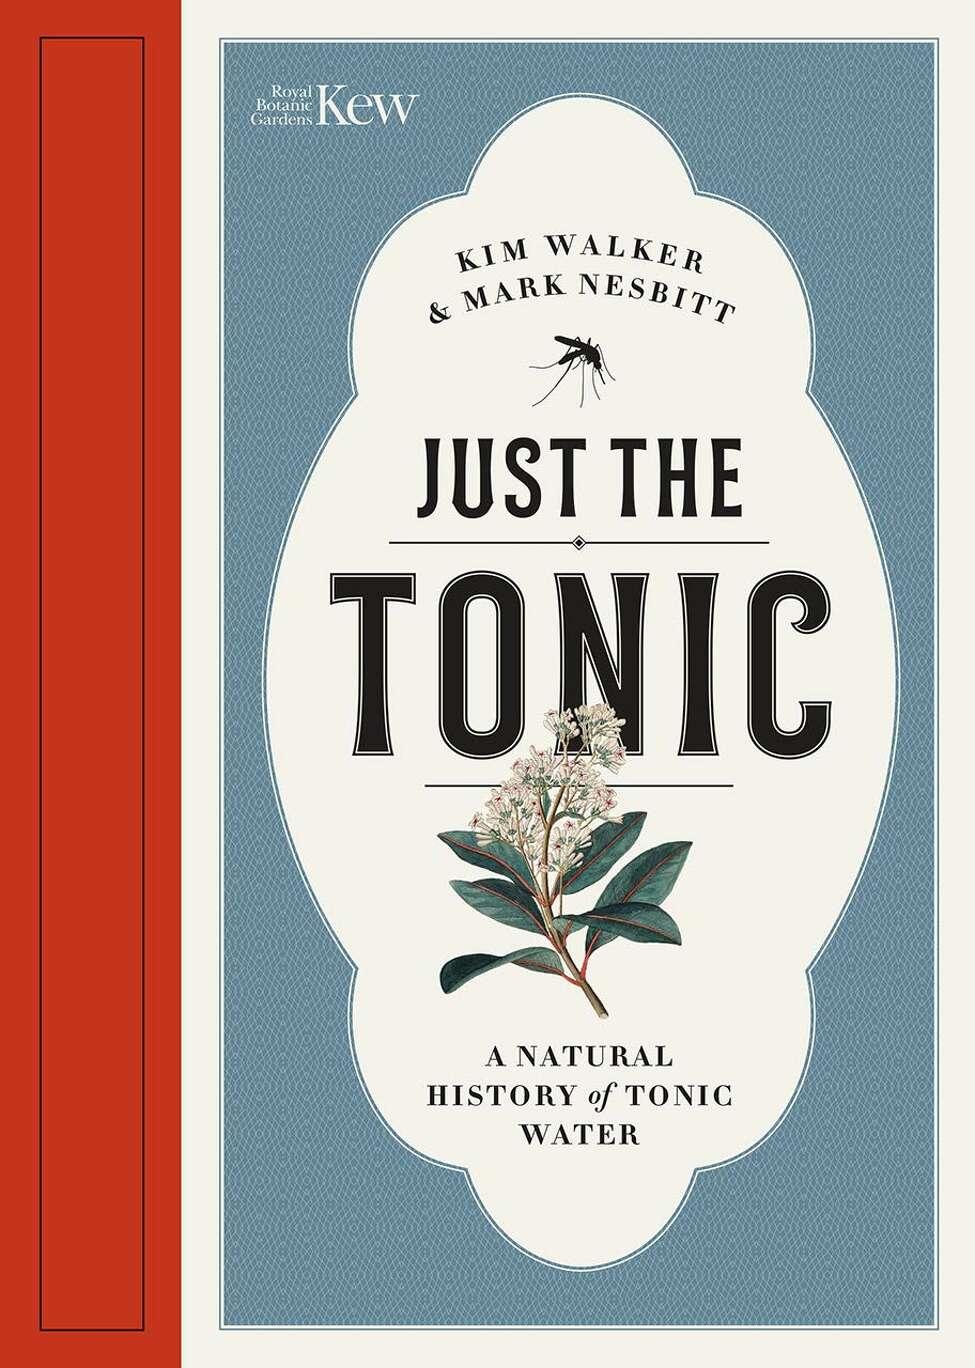 Just the Tonic - A Natural History of Tonic Water (Royal Botanic Gardens/TNS)